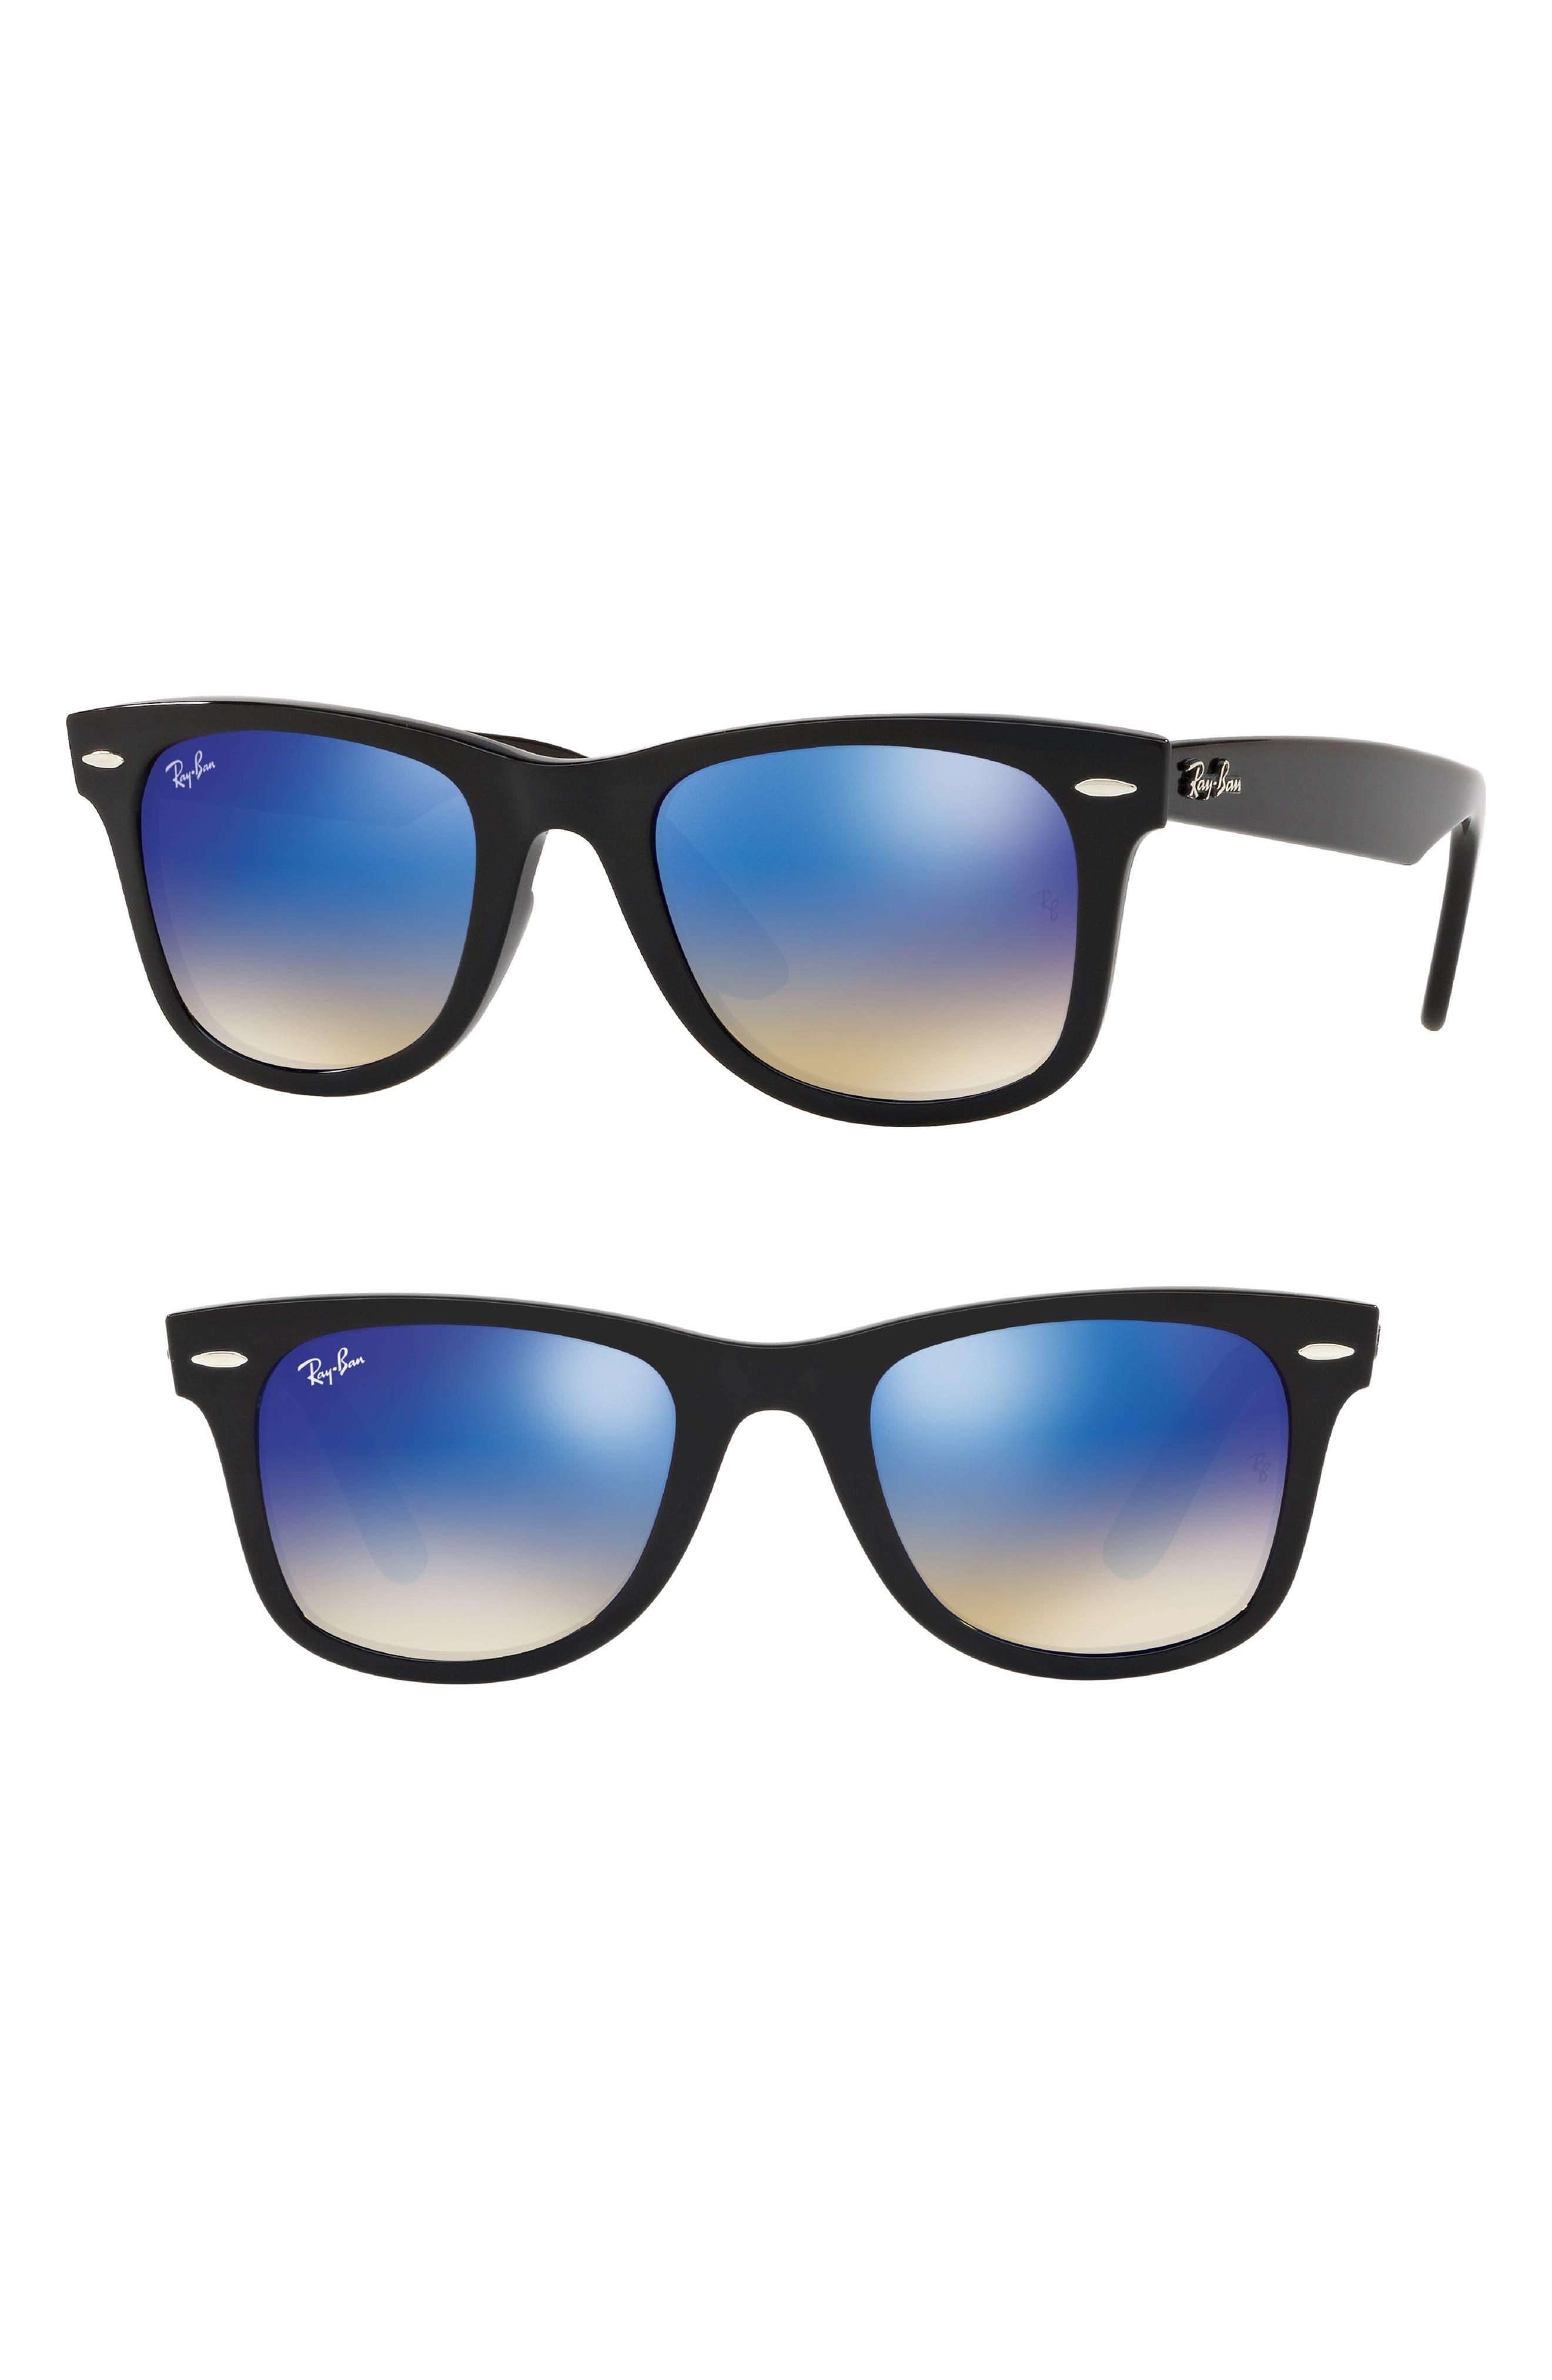 Ray-Ban Wayfarer 50Mm Mirrored Sunglasses - Black